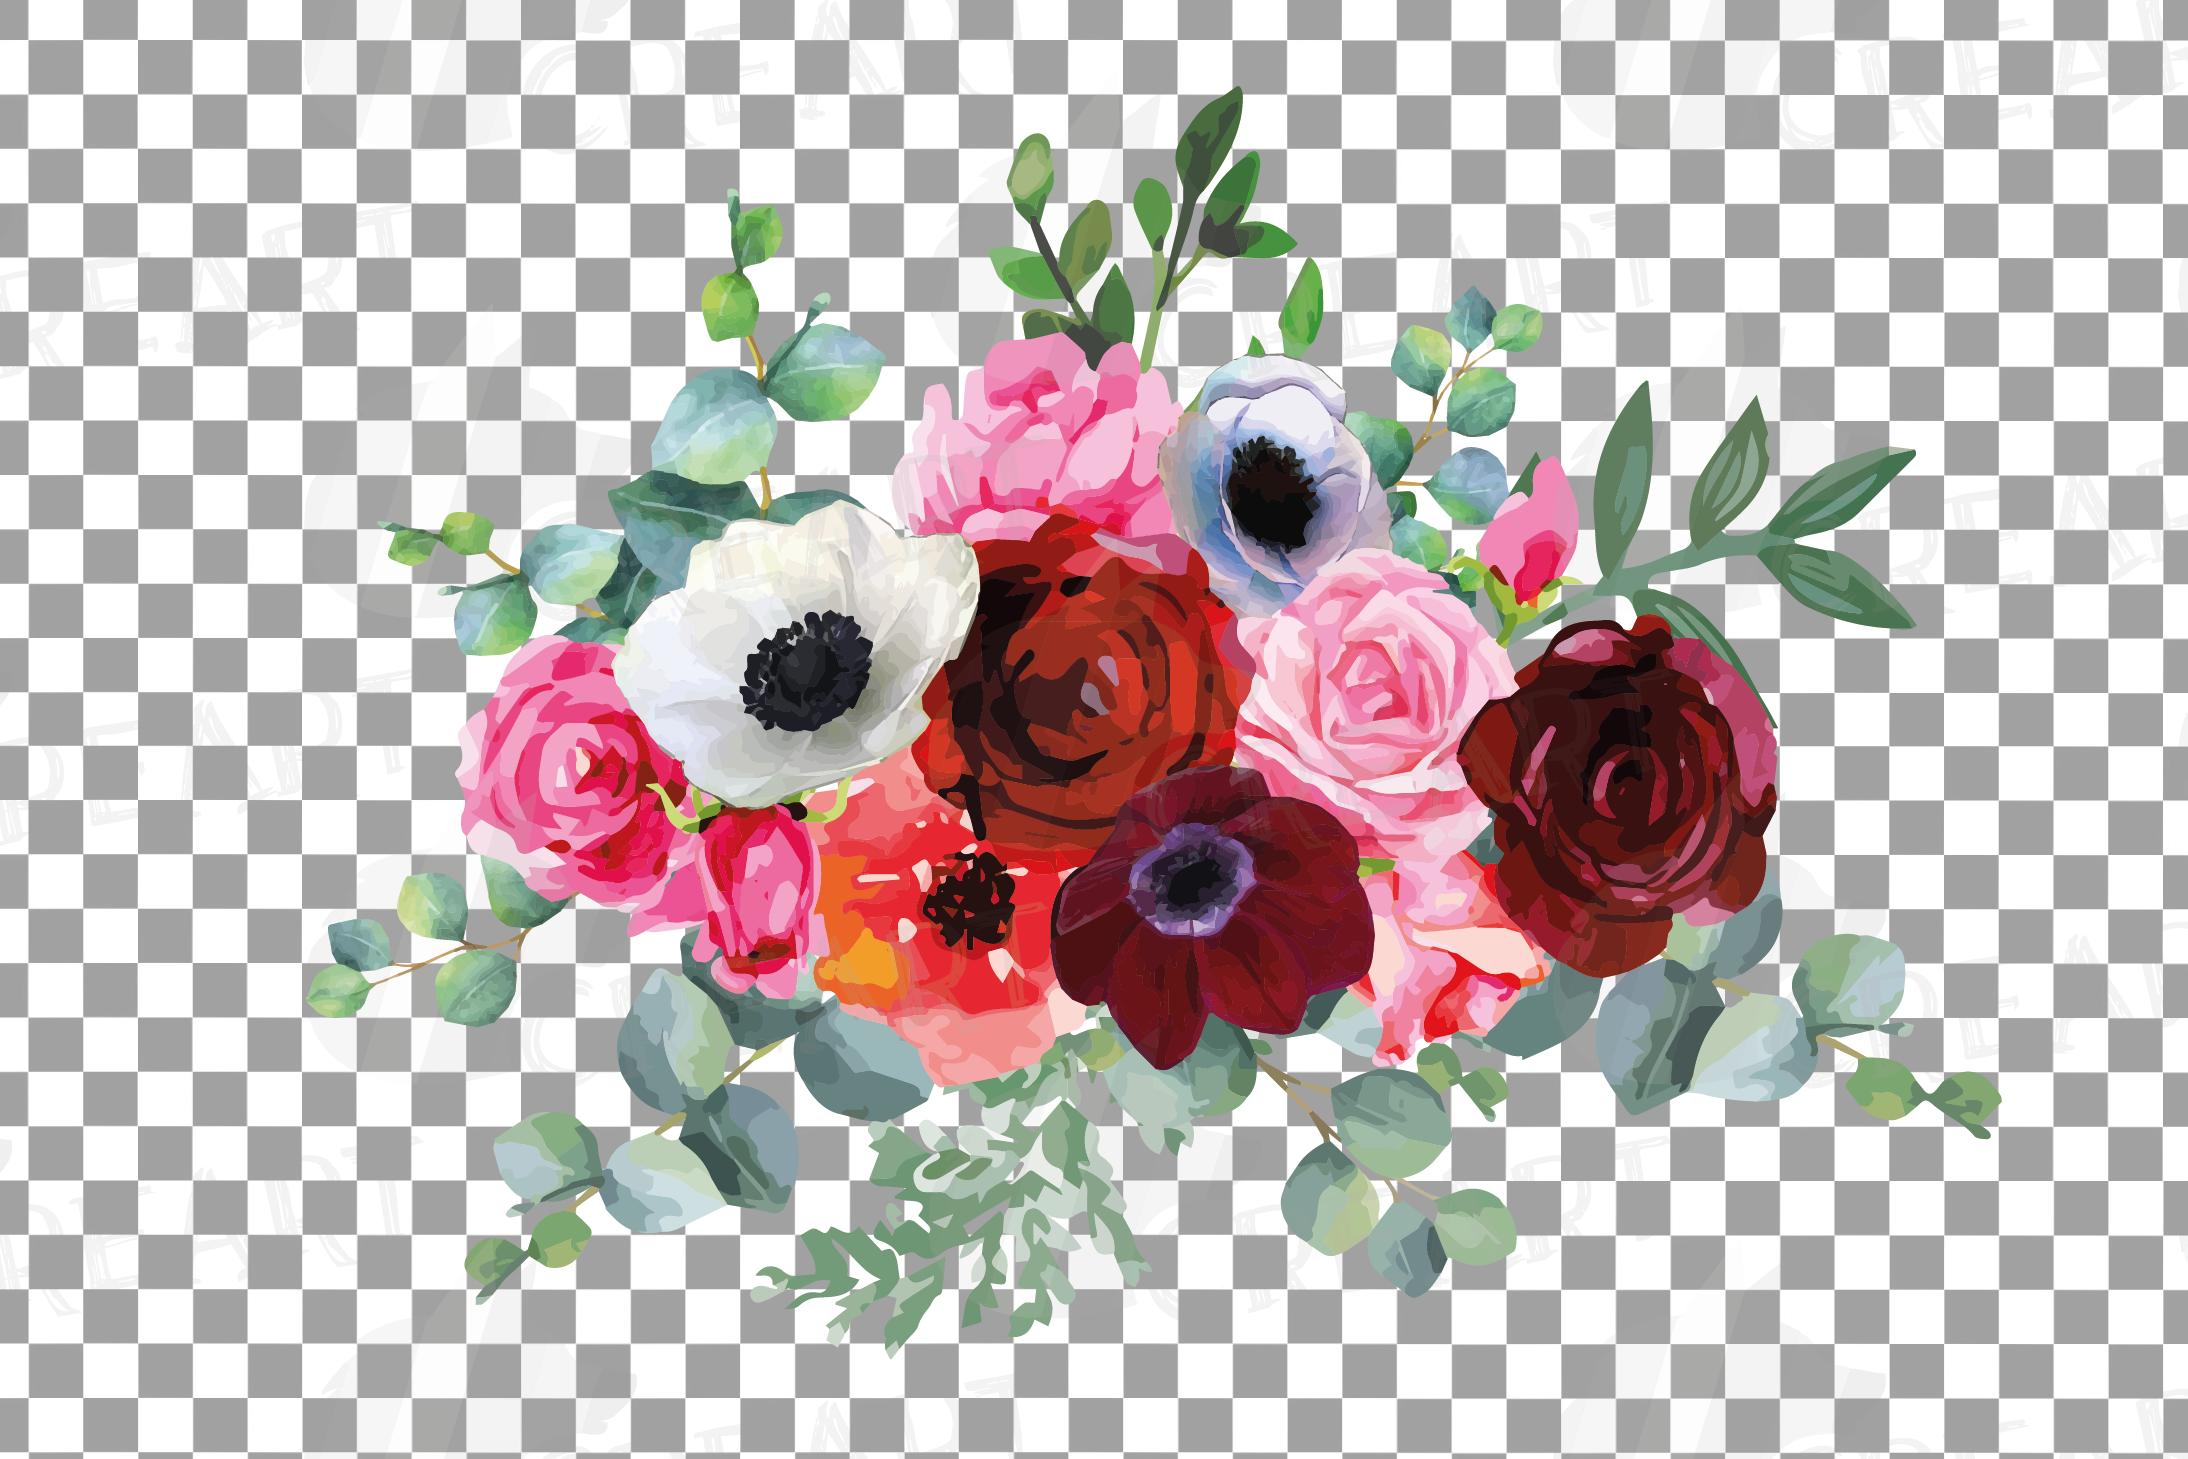 Watercolor elegant floral bouquets, rose, anemone decoration example image 13